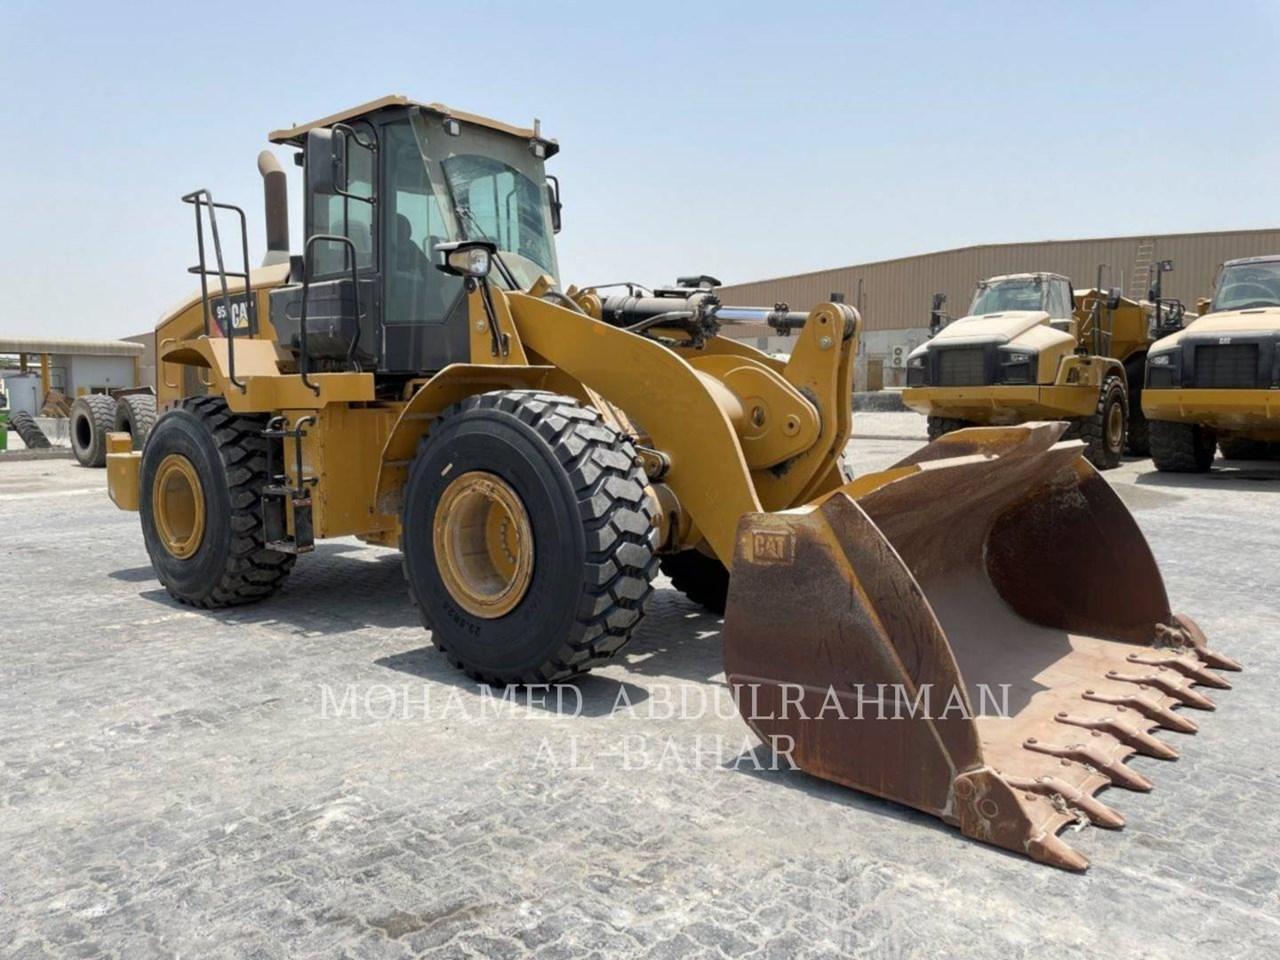 2018 Caterpillar 950 G C Image 6